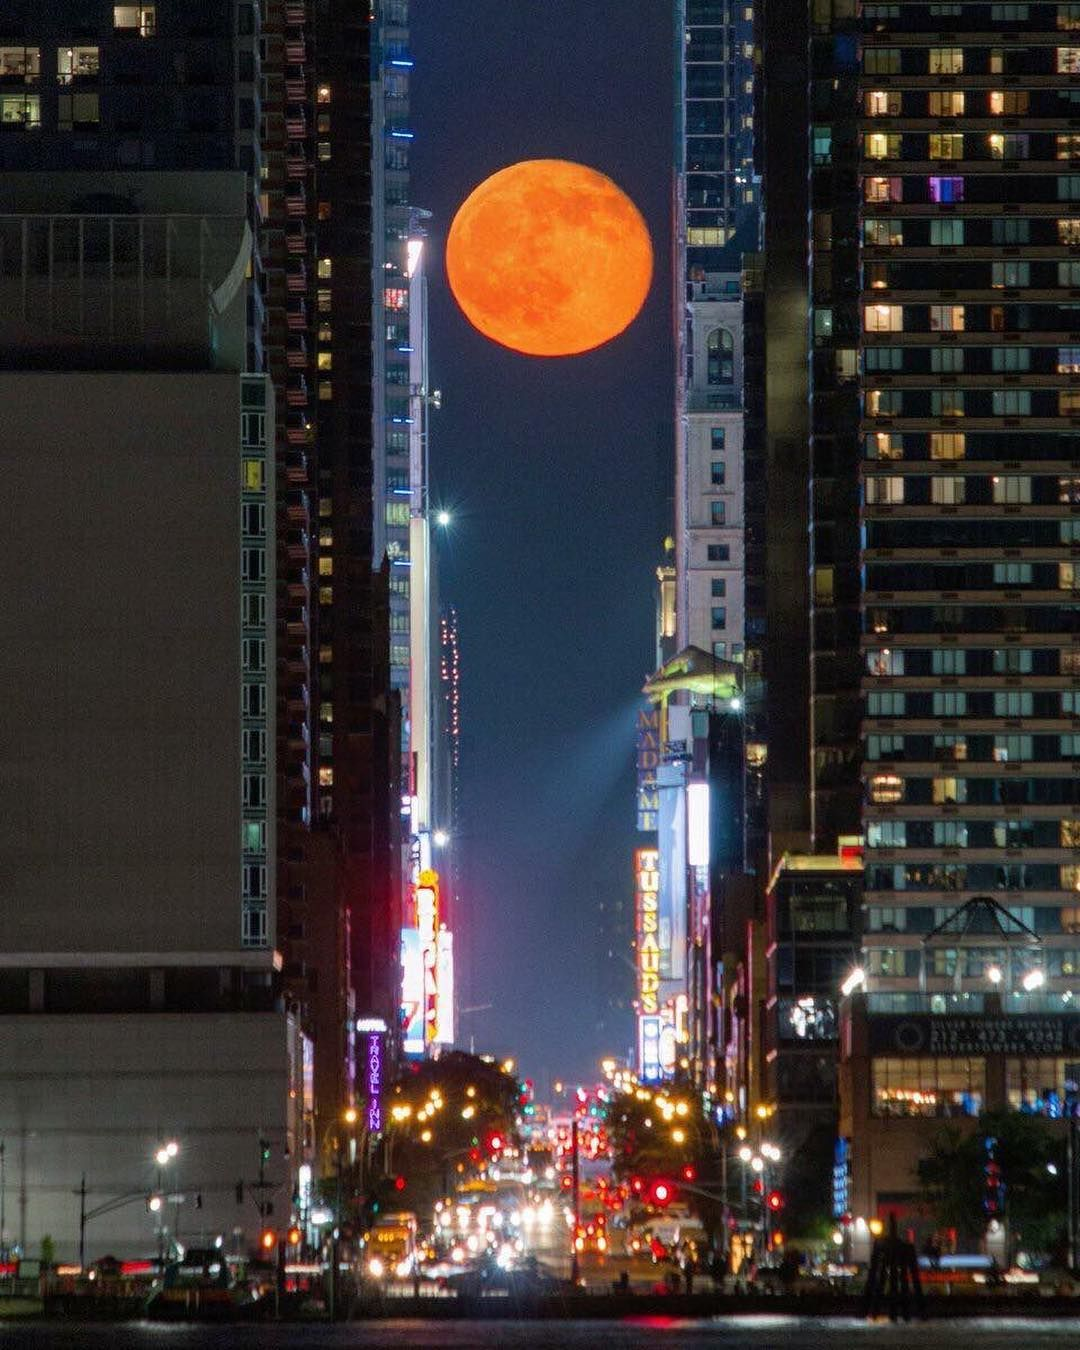 blood moon 2019 new york city - photo #23